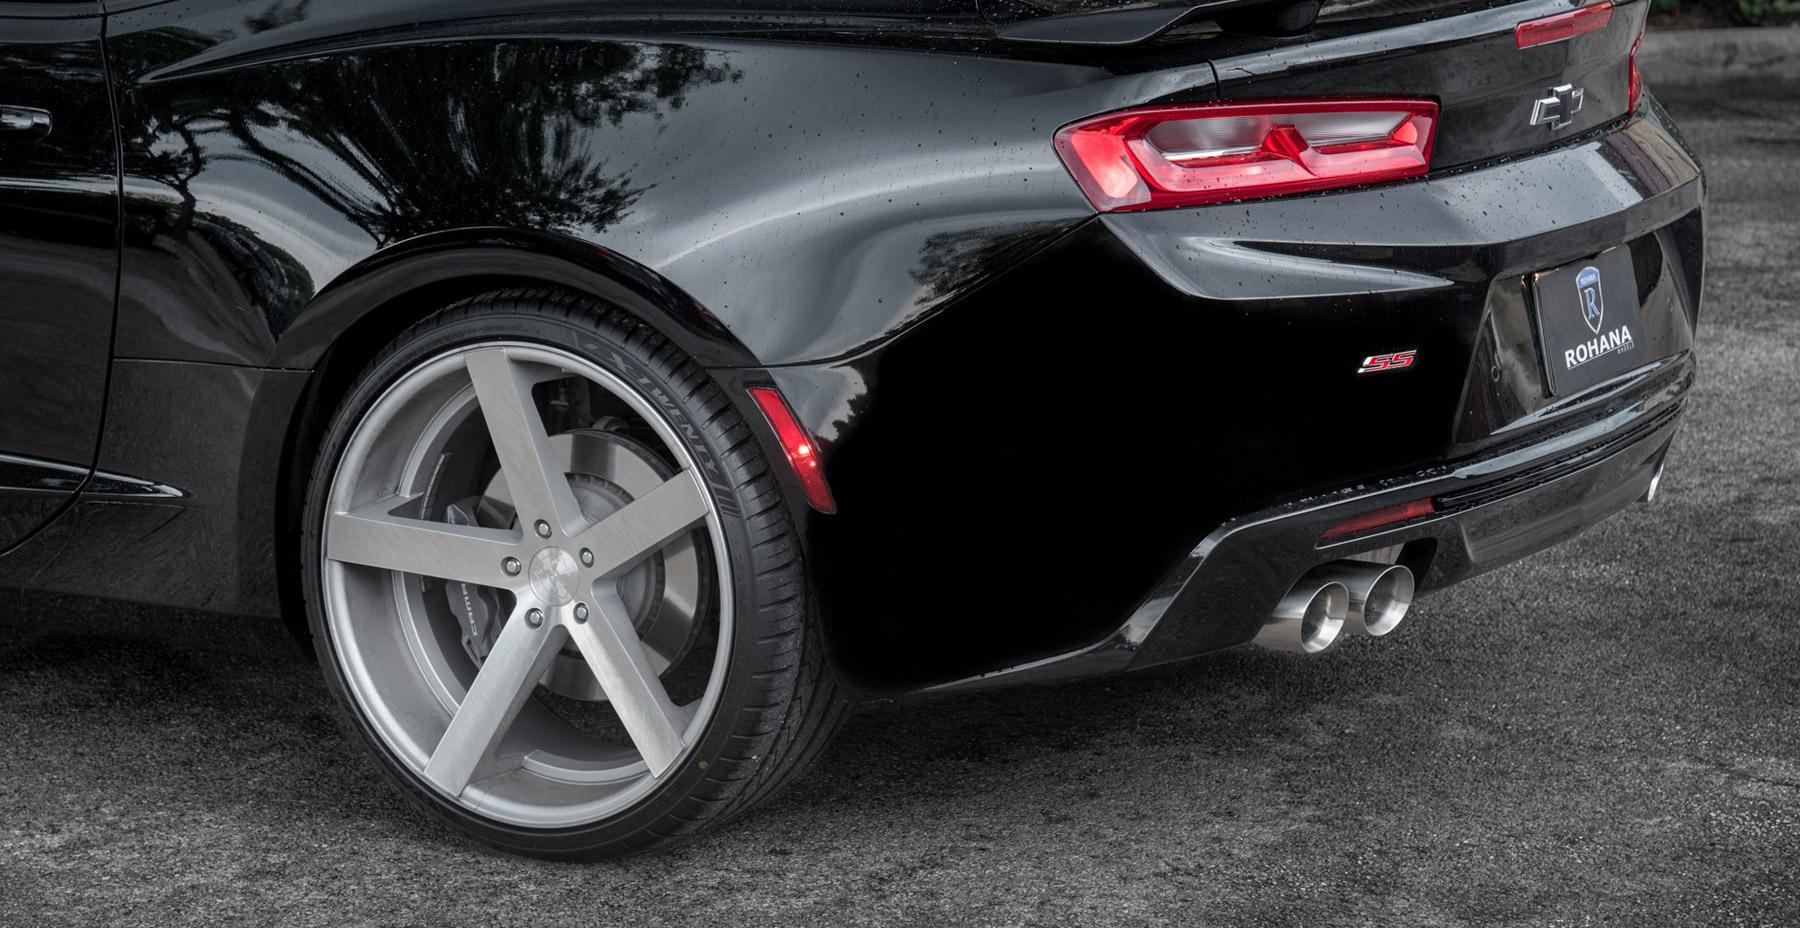 Black Chevrolet Camaro x Rohana RC22 Wheels (Finished in Machine Silver)